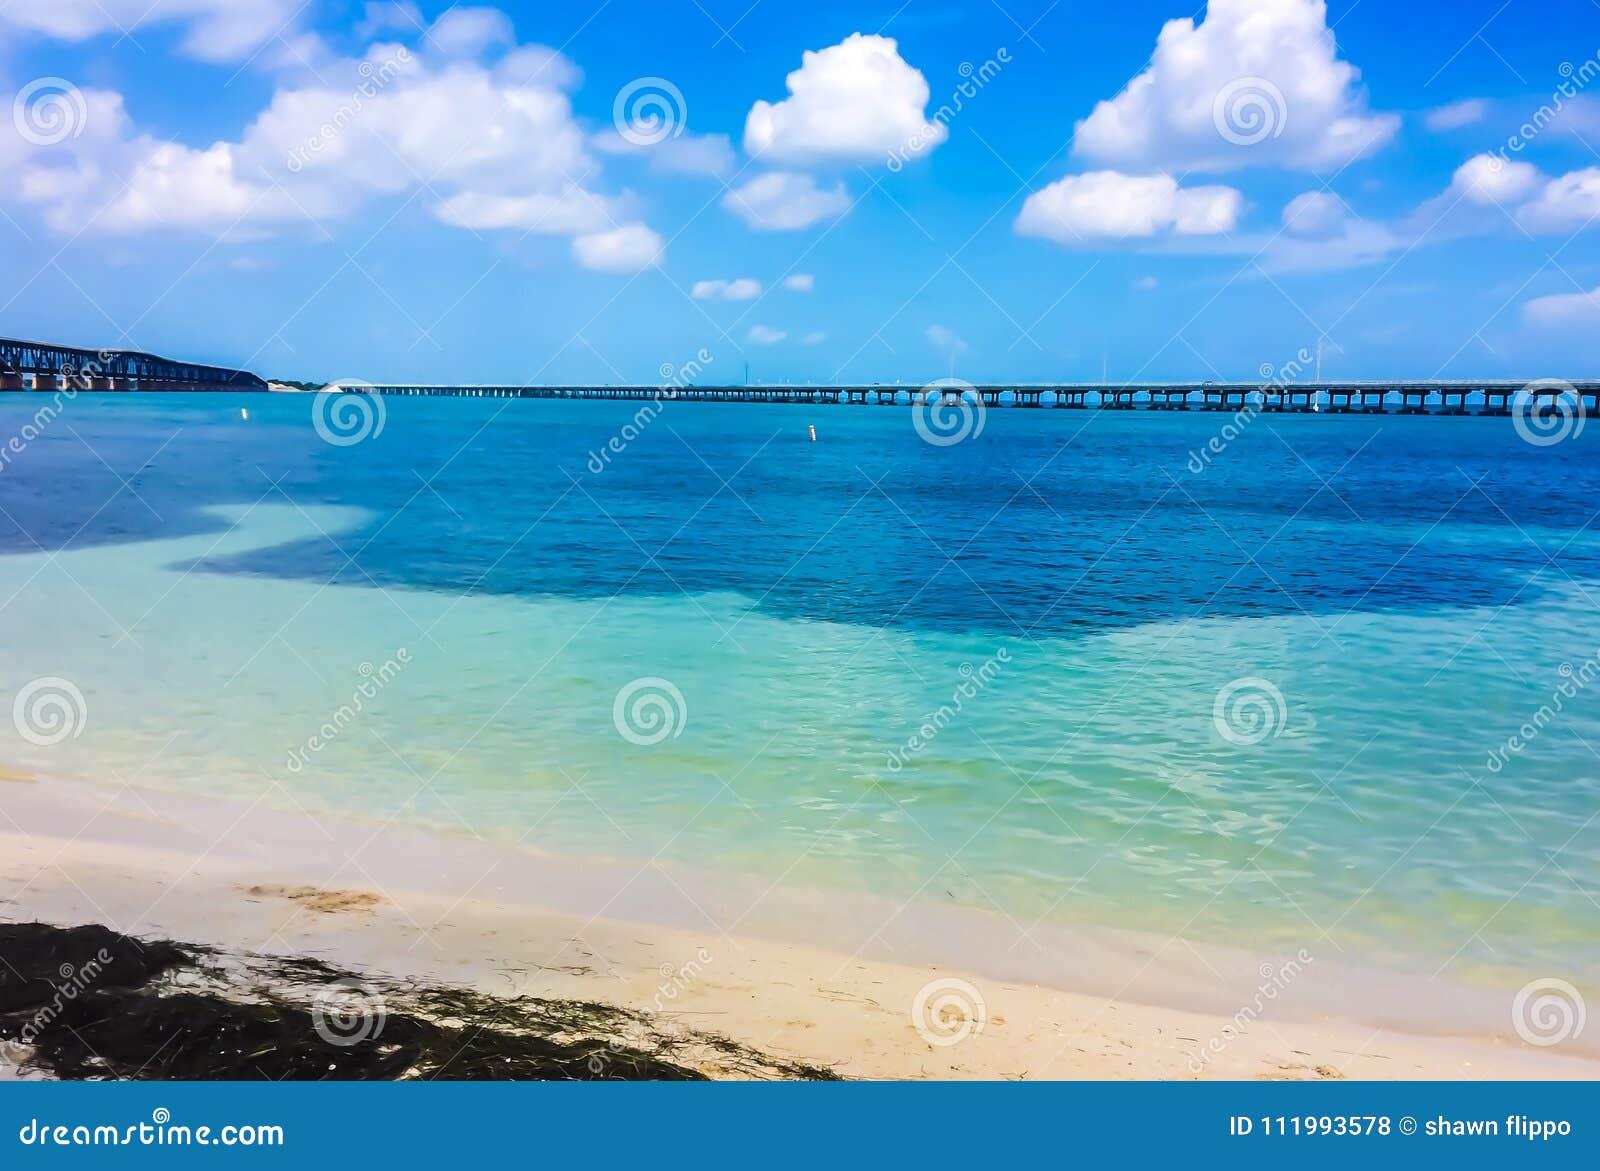 Bahia Honda state park with bridge